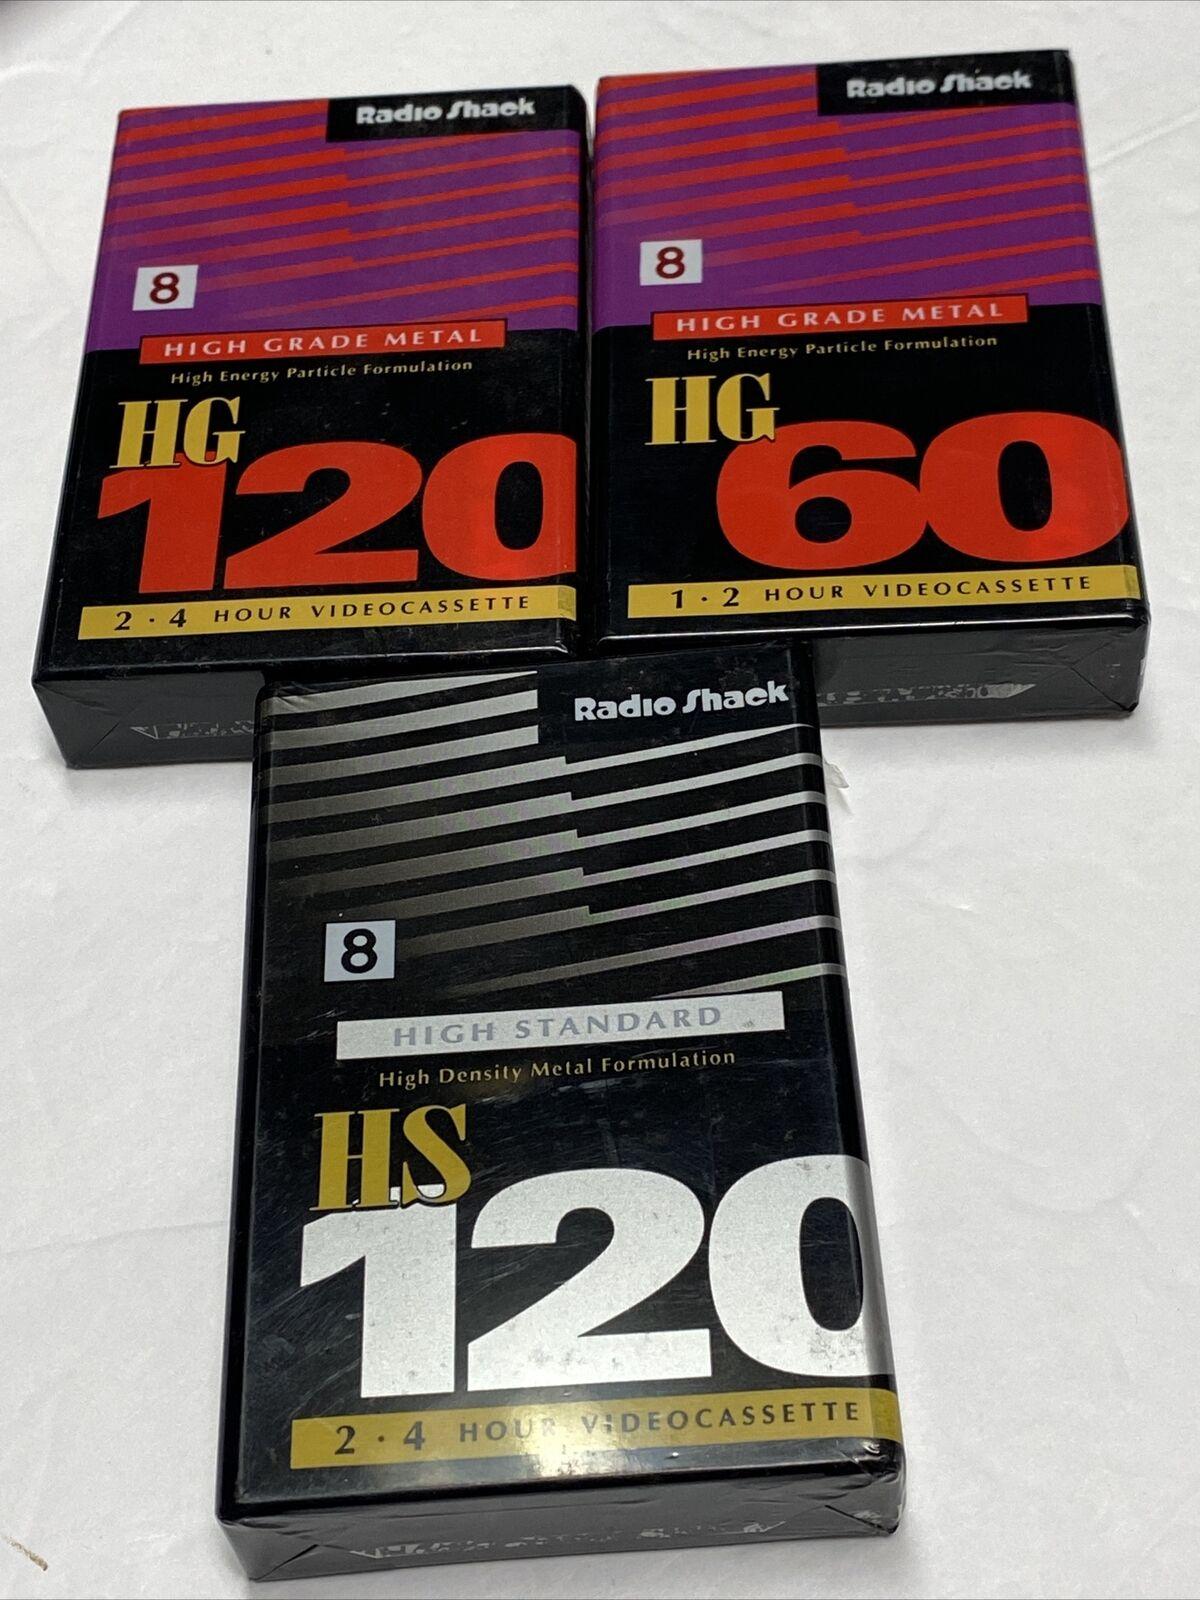 LOT of 3, RadioShack NTS8 8mm Professional Quality Camcorder Video Tape HG Metal